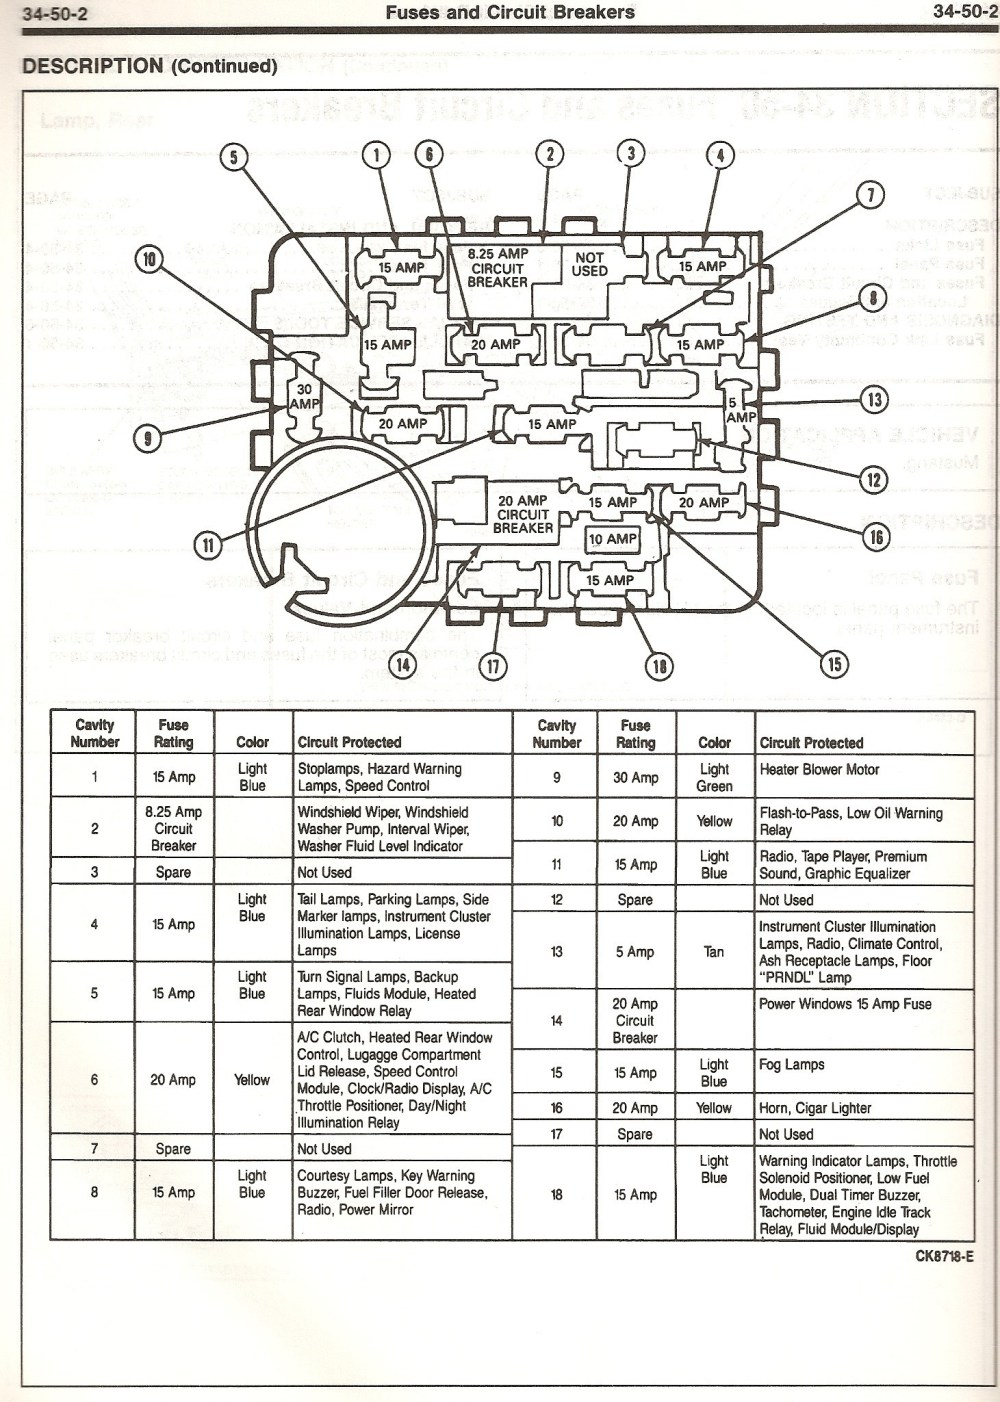 medium resolution of 1985 mustang gt fusebox diagram ford mustang forum wiring diagram dat 1996 mustang fuse diagram wiring